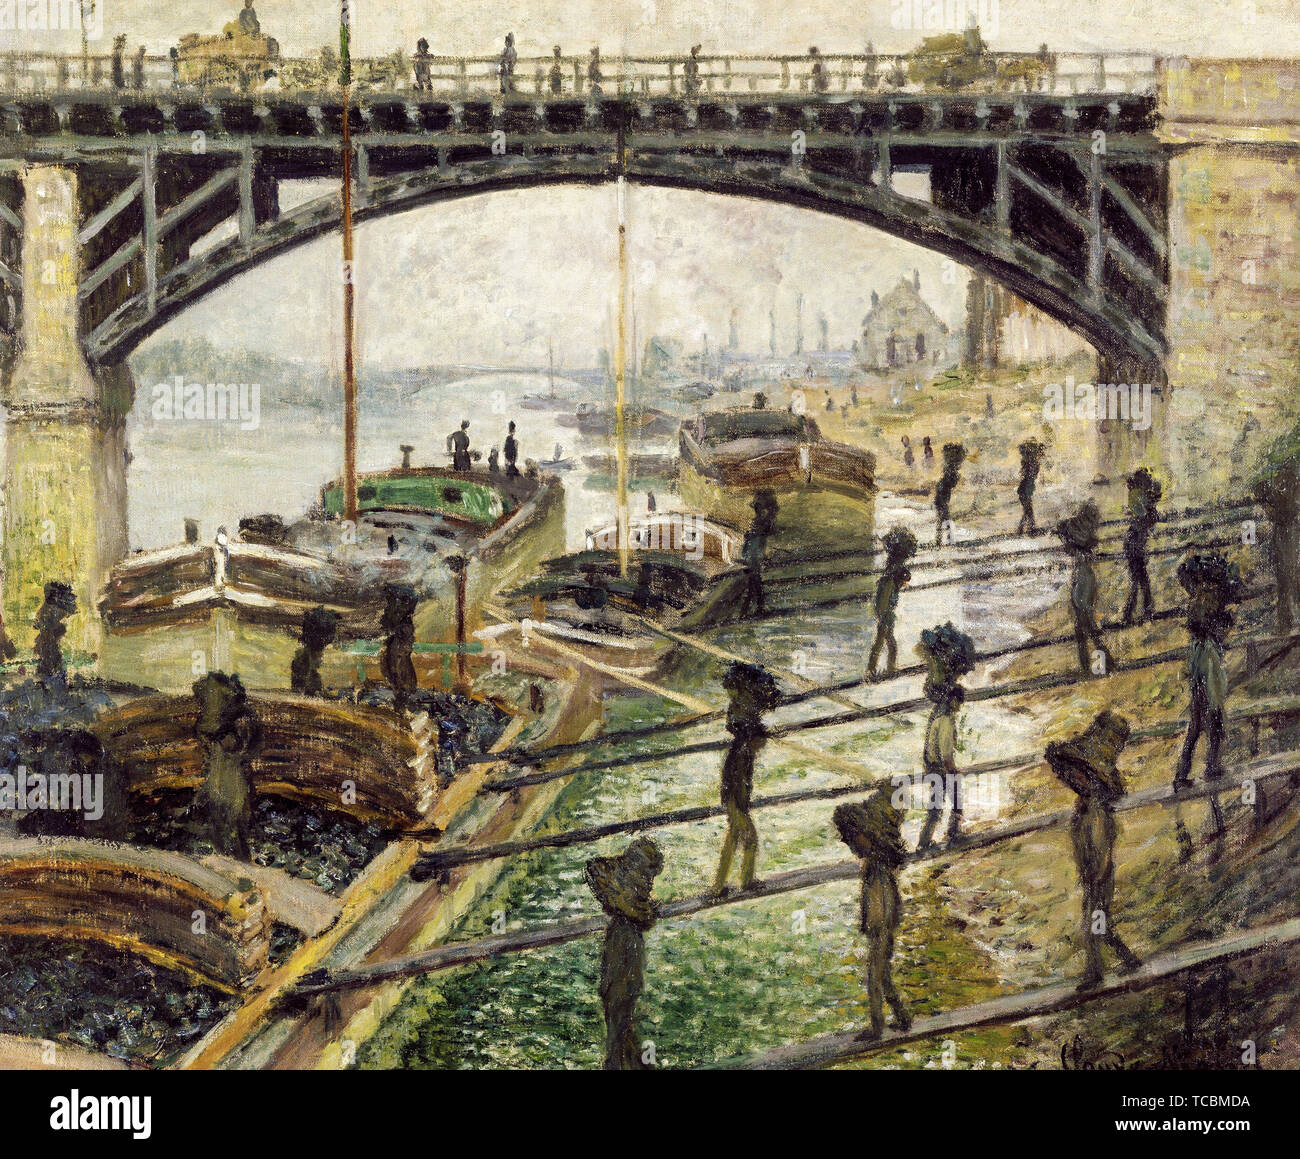 Claude Monet, The Coalmen, painting, circa 1875 - Stock Image